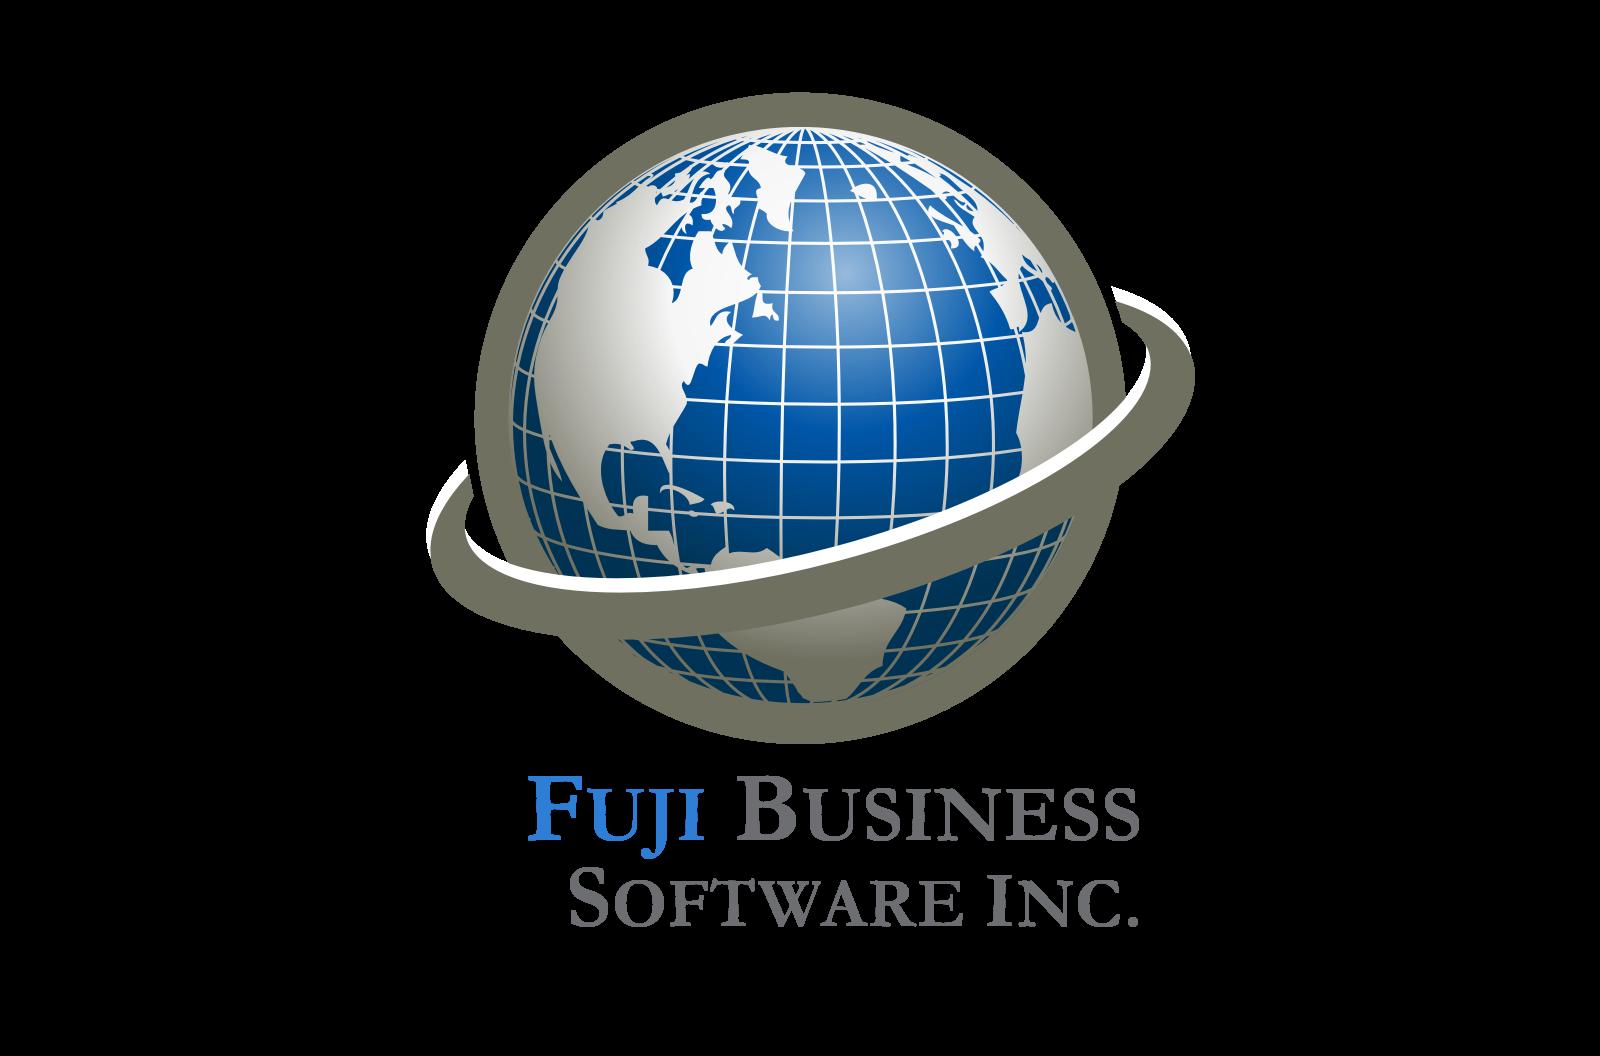 Fuji Business International